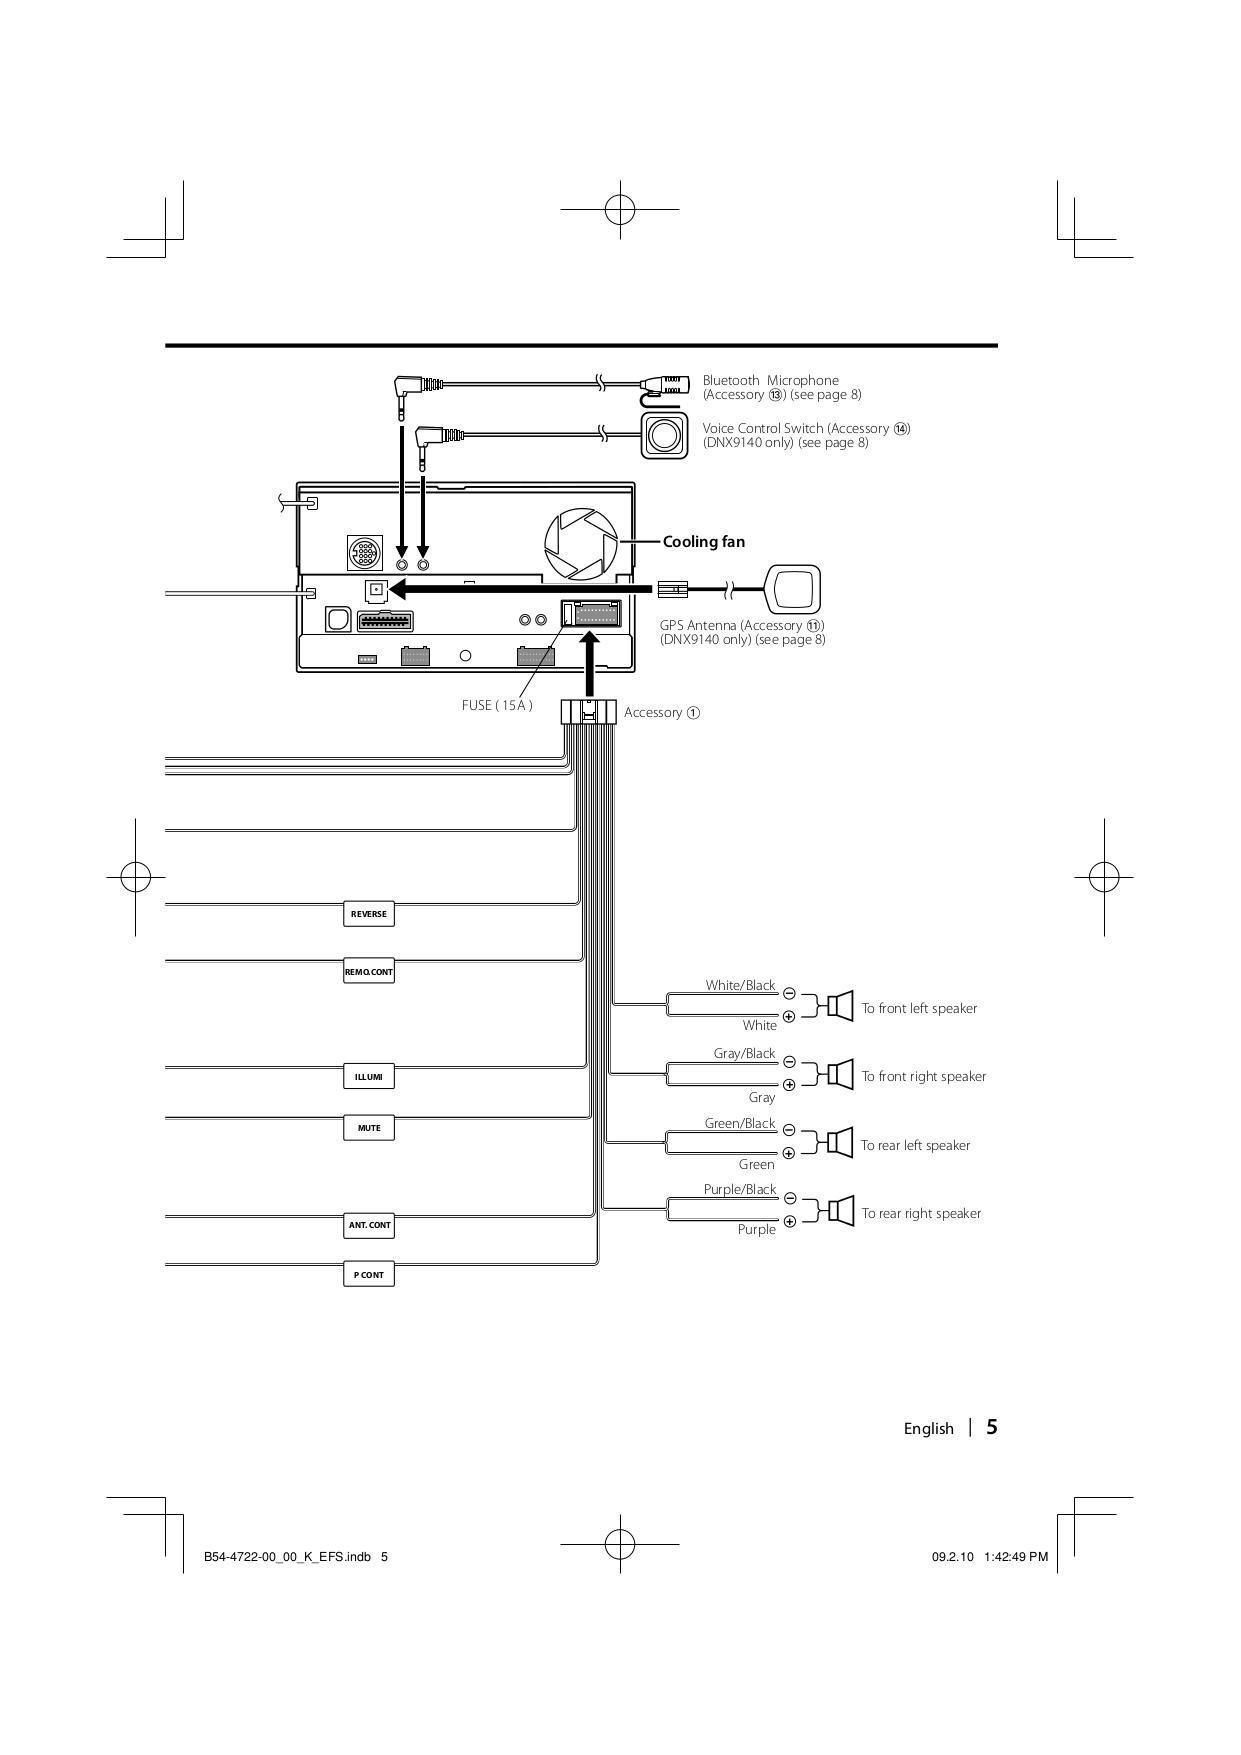 kenwood dnx 9140 manual online user manual u2022 rh pandadigital co Kenwood DNX6190HD Kenwood DNX6190HD